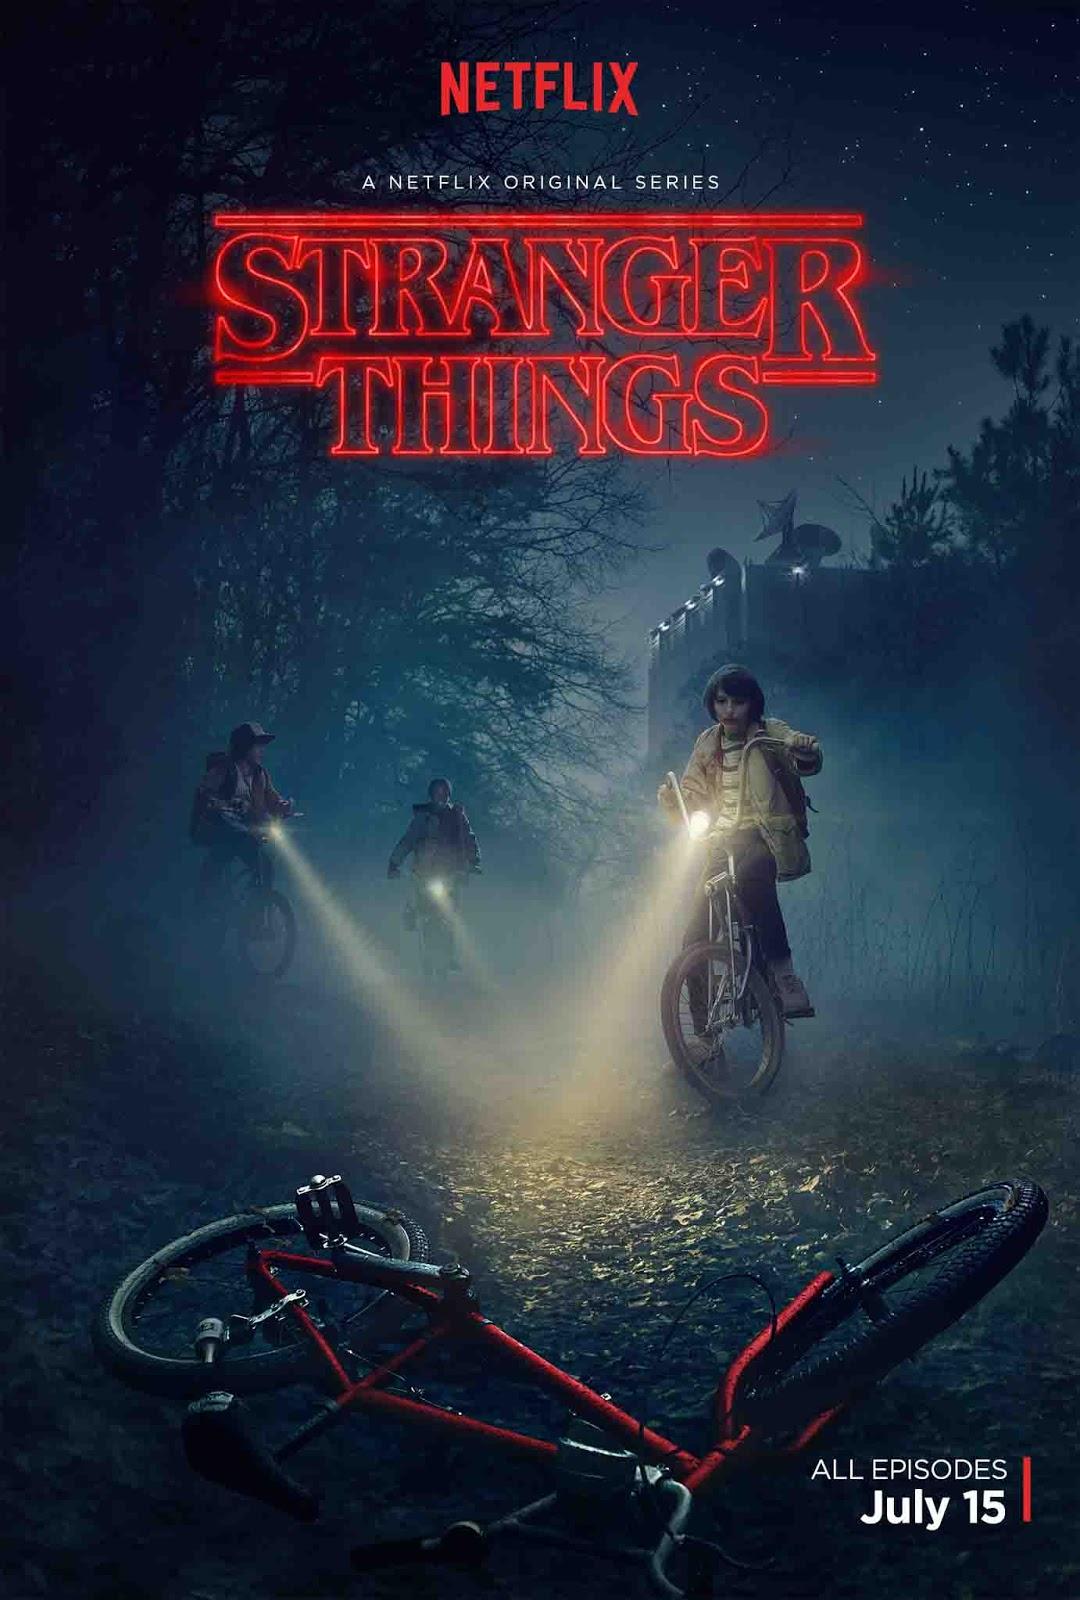 Stranger Things 1ª Temporada Torrent - WEBRip 720p/1080p/4K Dual Áudio